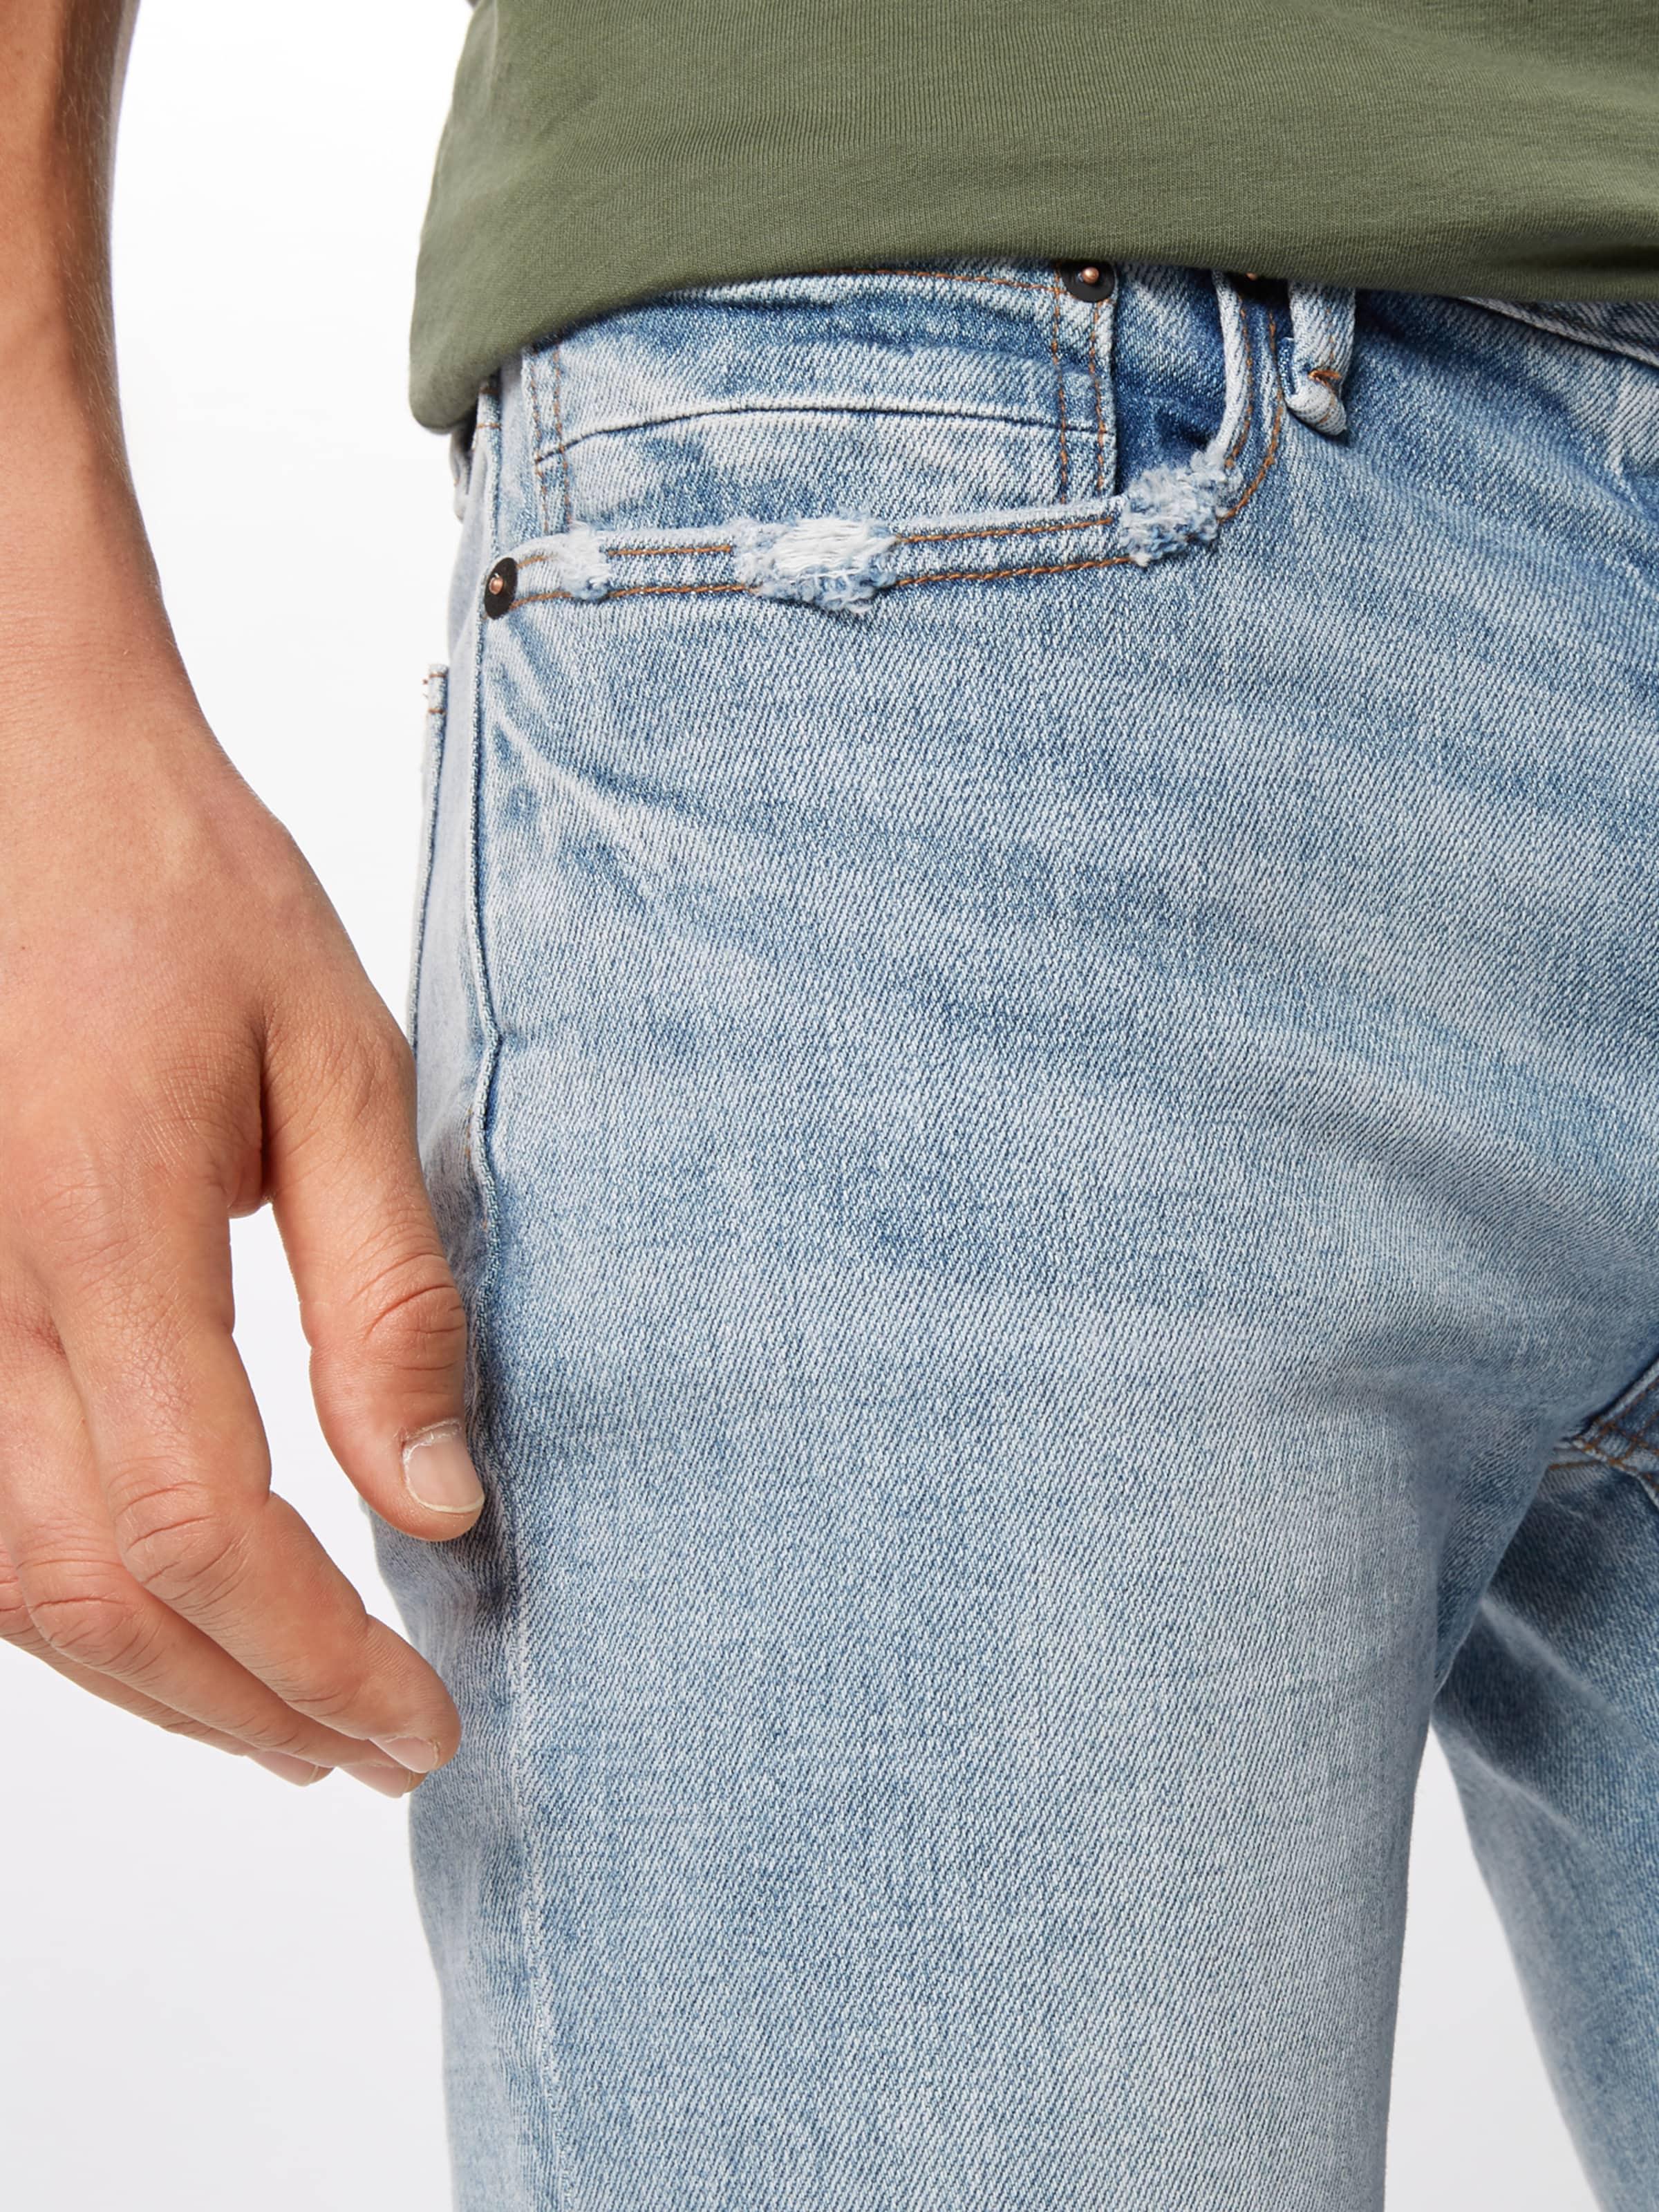 Bsu' Bleu En Denim Jean 'bolt Denham 4jLAR5